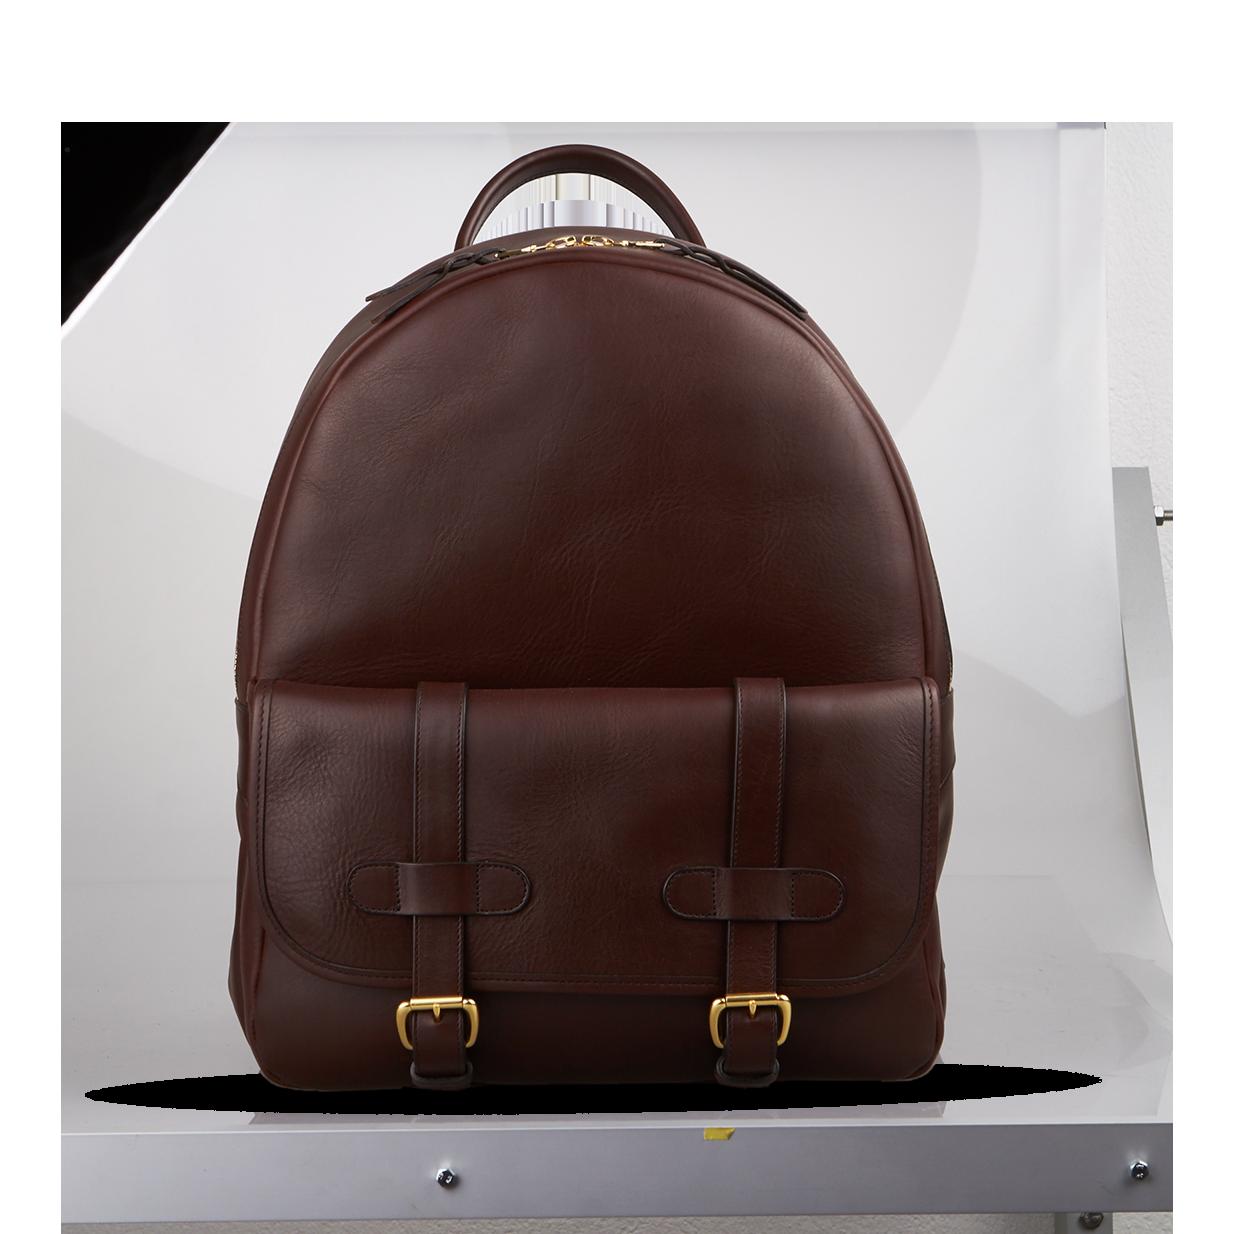 deb75480131a frank clegg chocolate hampton zipper backpack front